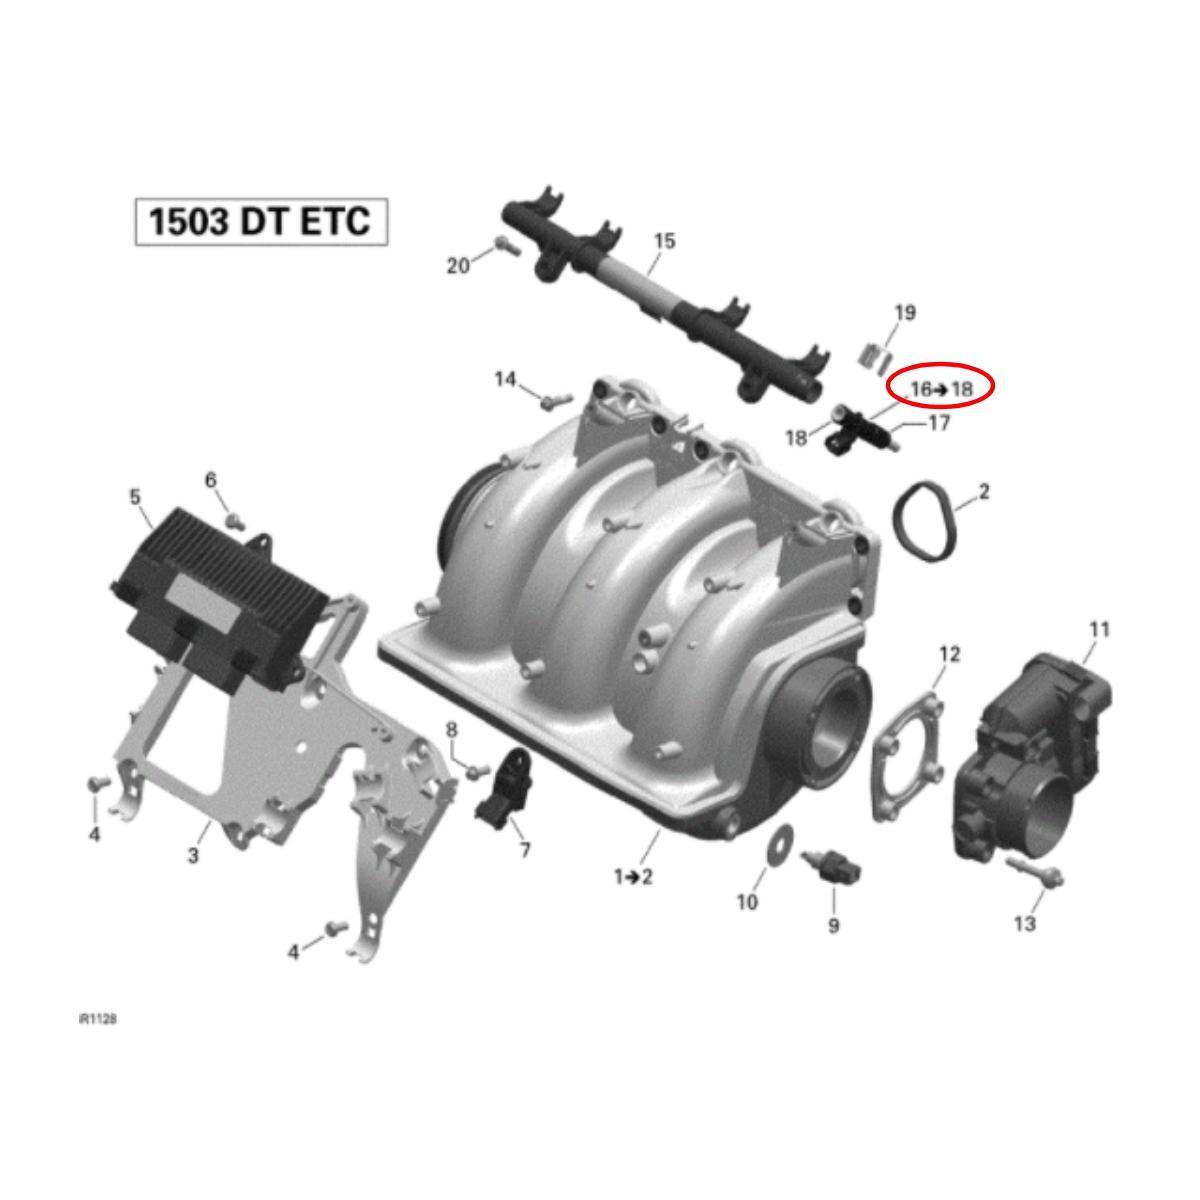 Bico Injetor para Jet Ski Sea Doo GTI/GTS 130 2011-2016  - Radical Peças - Peças para Jet Ski